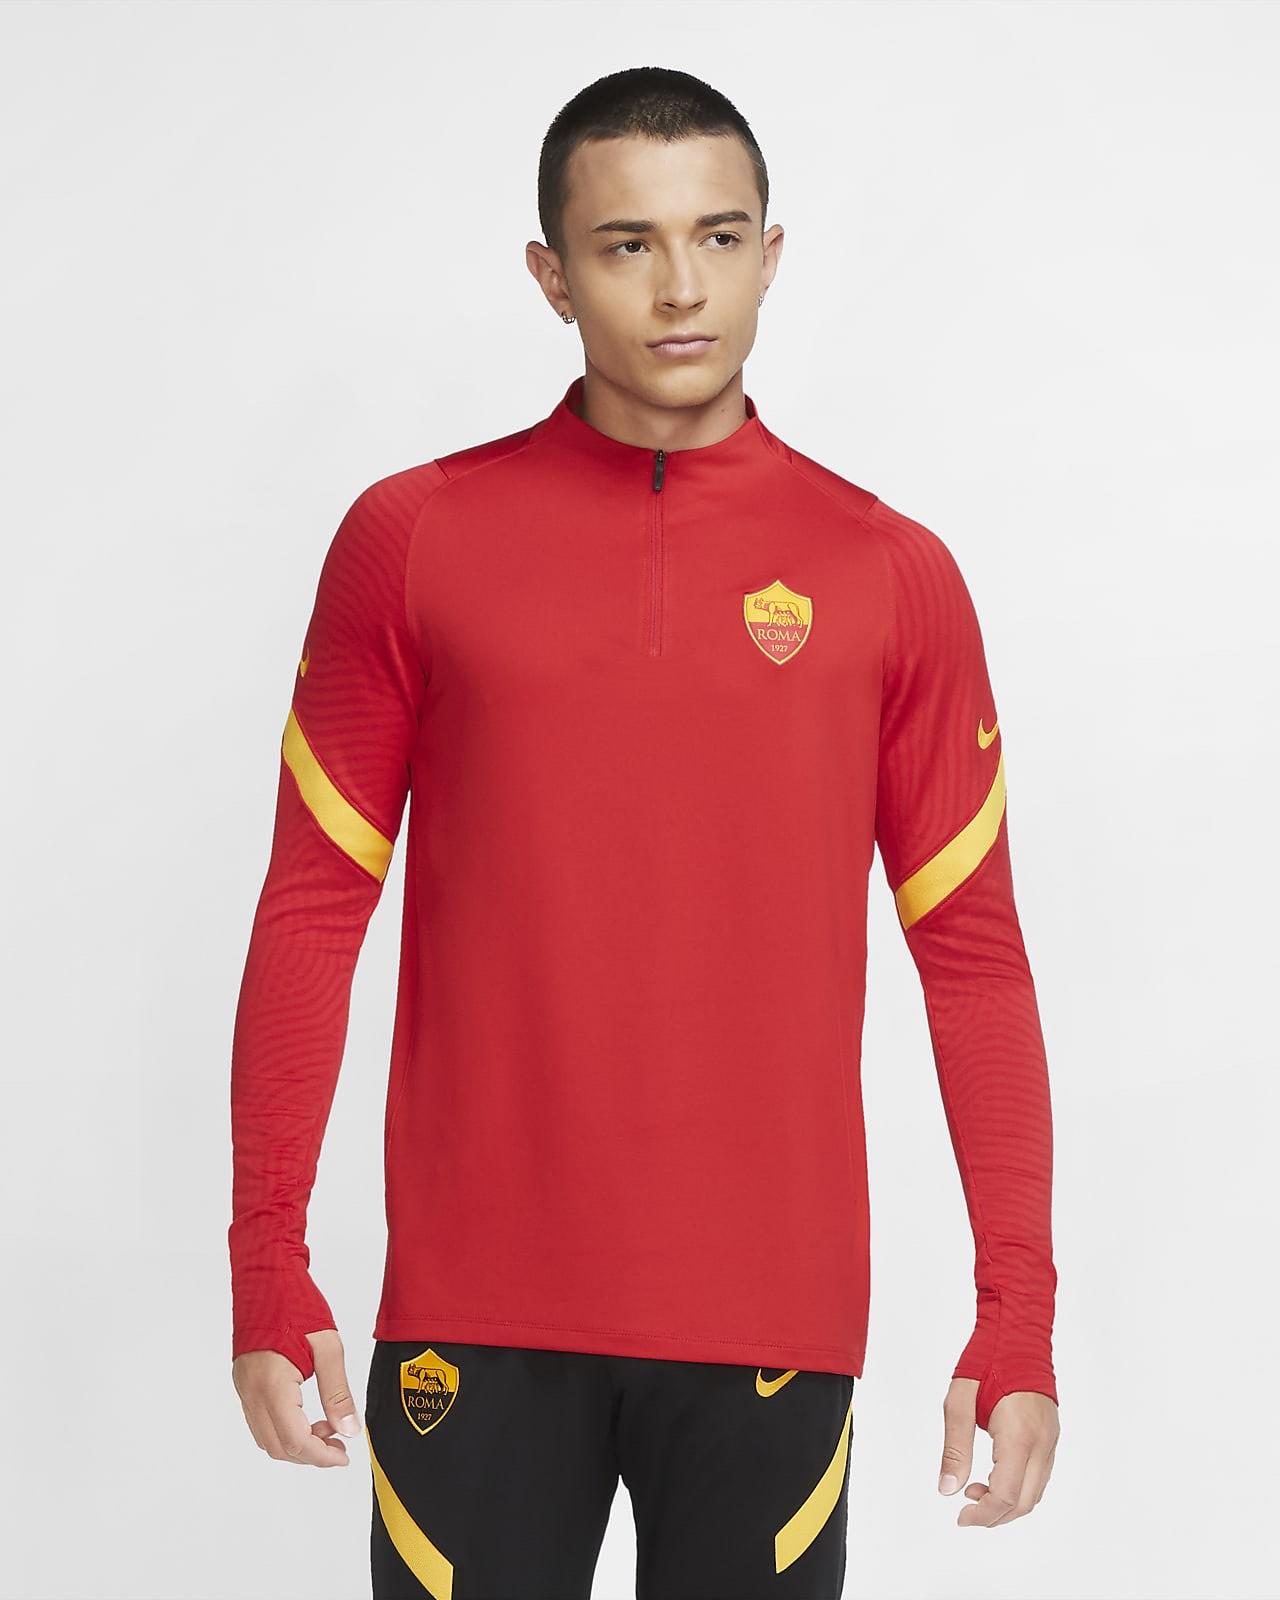 Camiseta de manga larga Nike strike entrenamiento Hombre AS Roma Strike